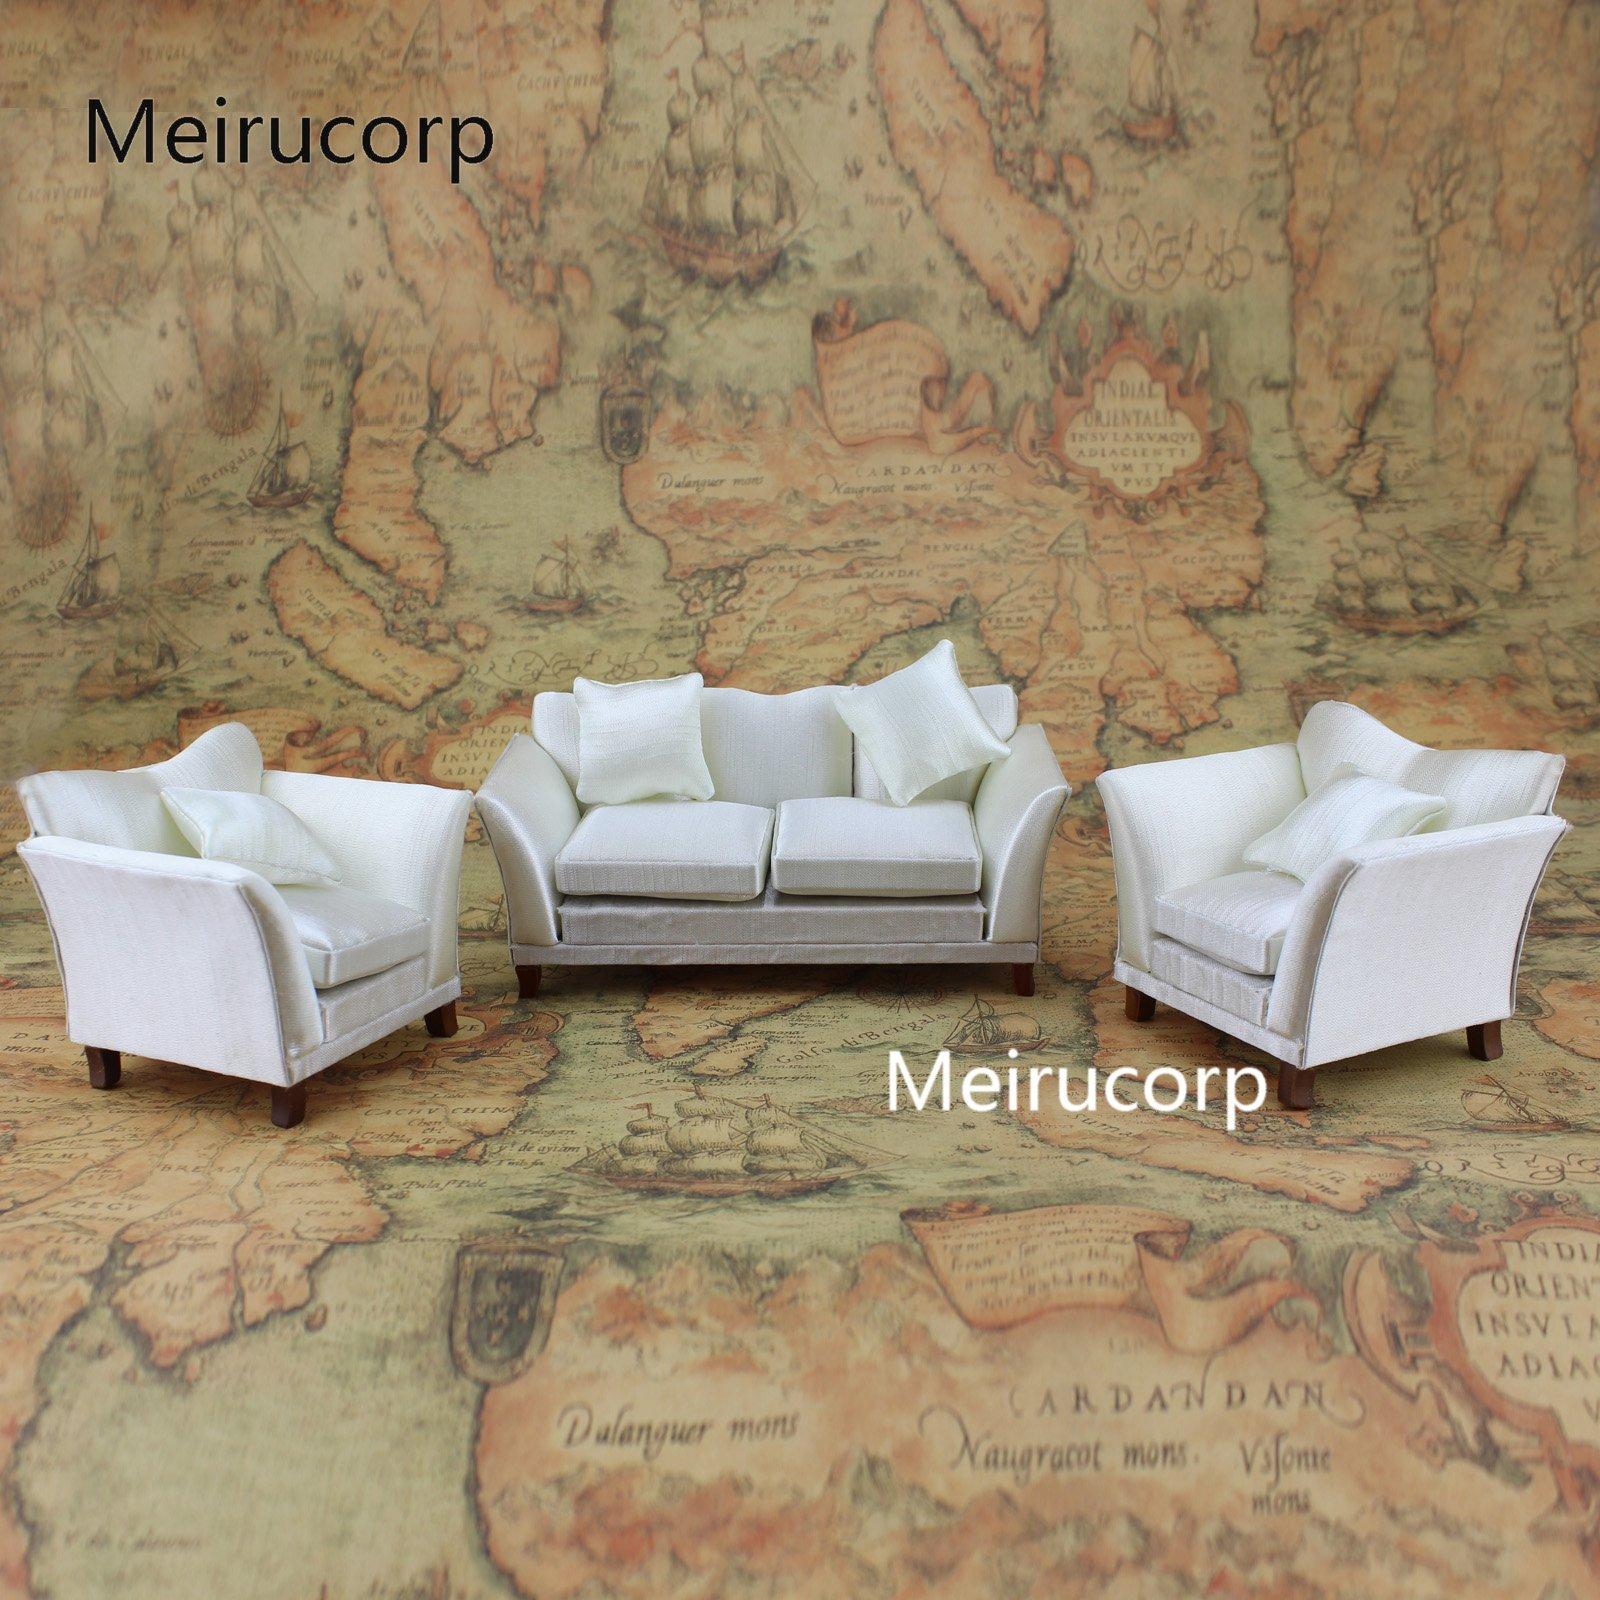 Meirucorp Dollhouse 1/12th Miniature Furniture Fabric Sofa and Chairs 3pcs Set